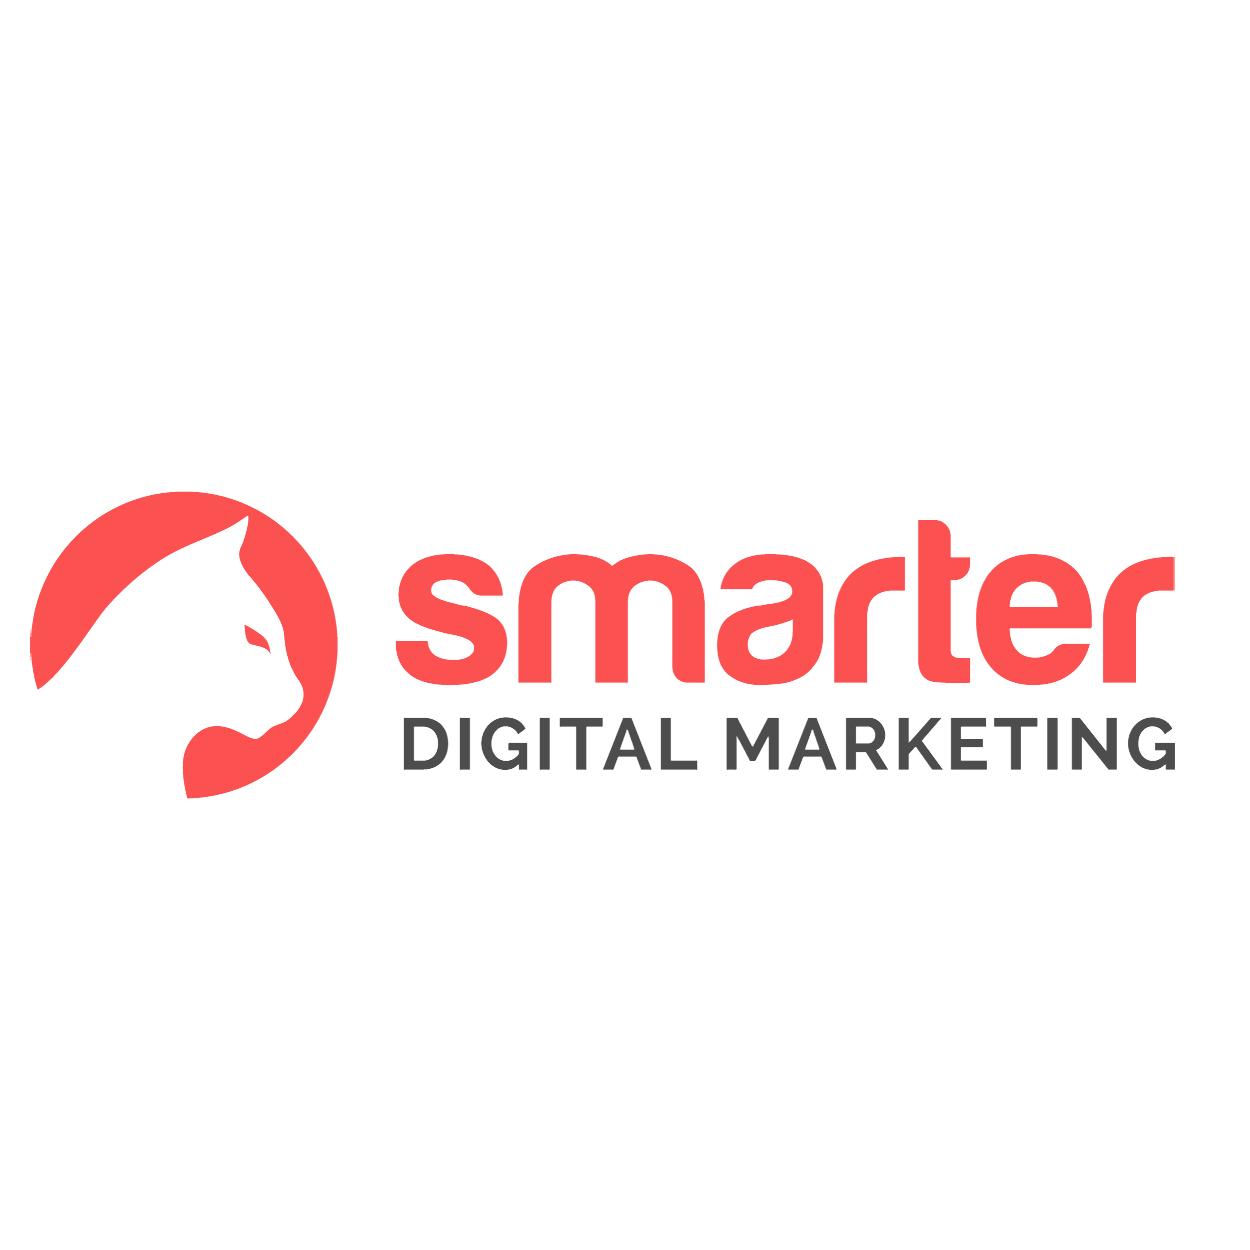 Smarter Digital Marketing Logo